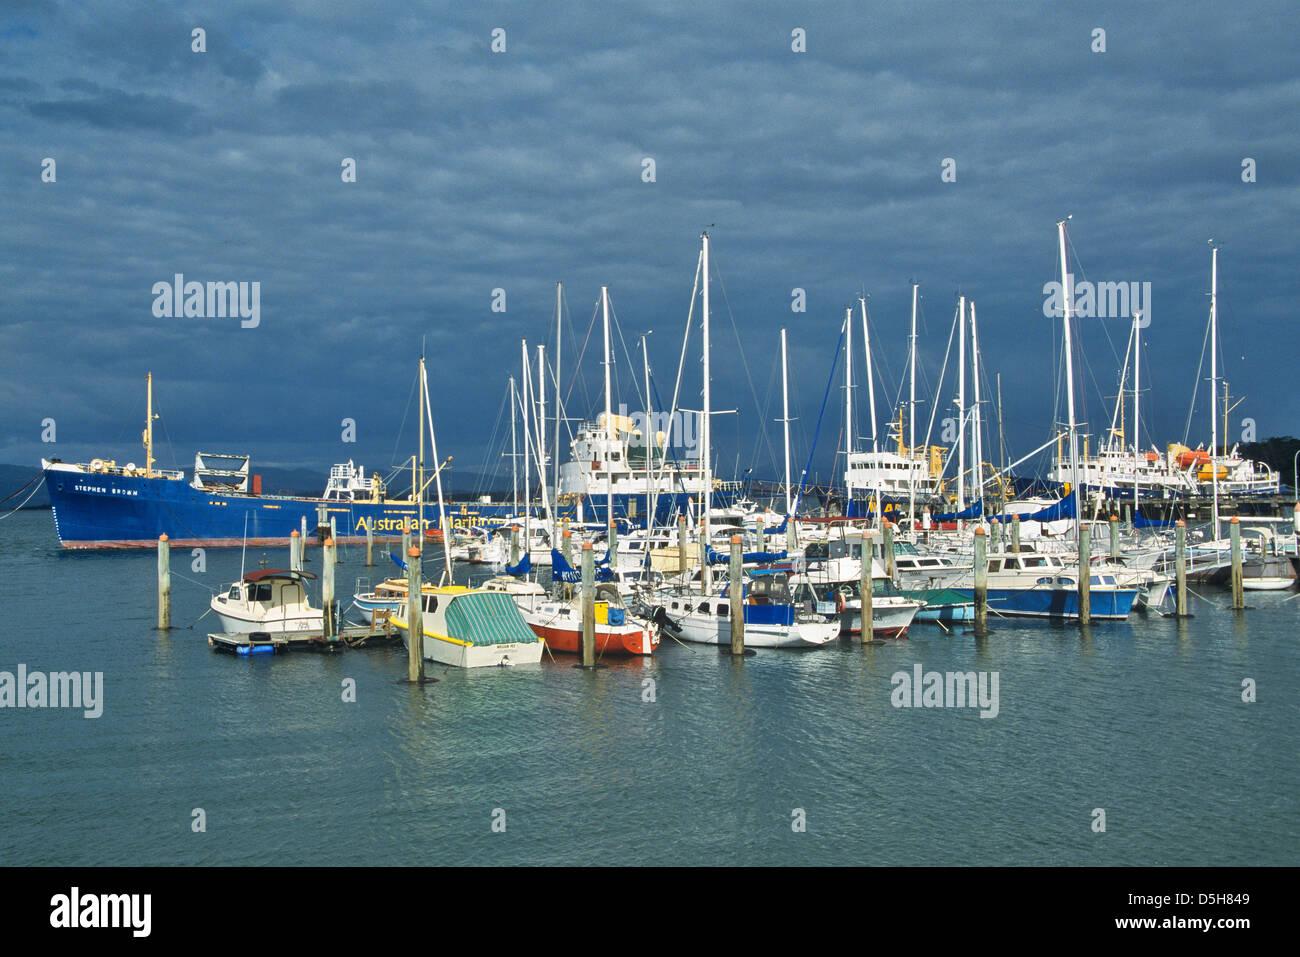 Australia, Northern Tasmania, River Tamar, Beauty Point marina Stock Photo